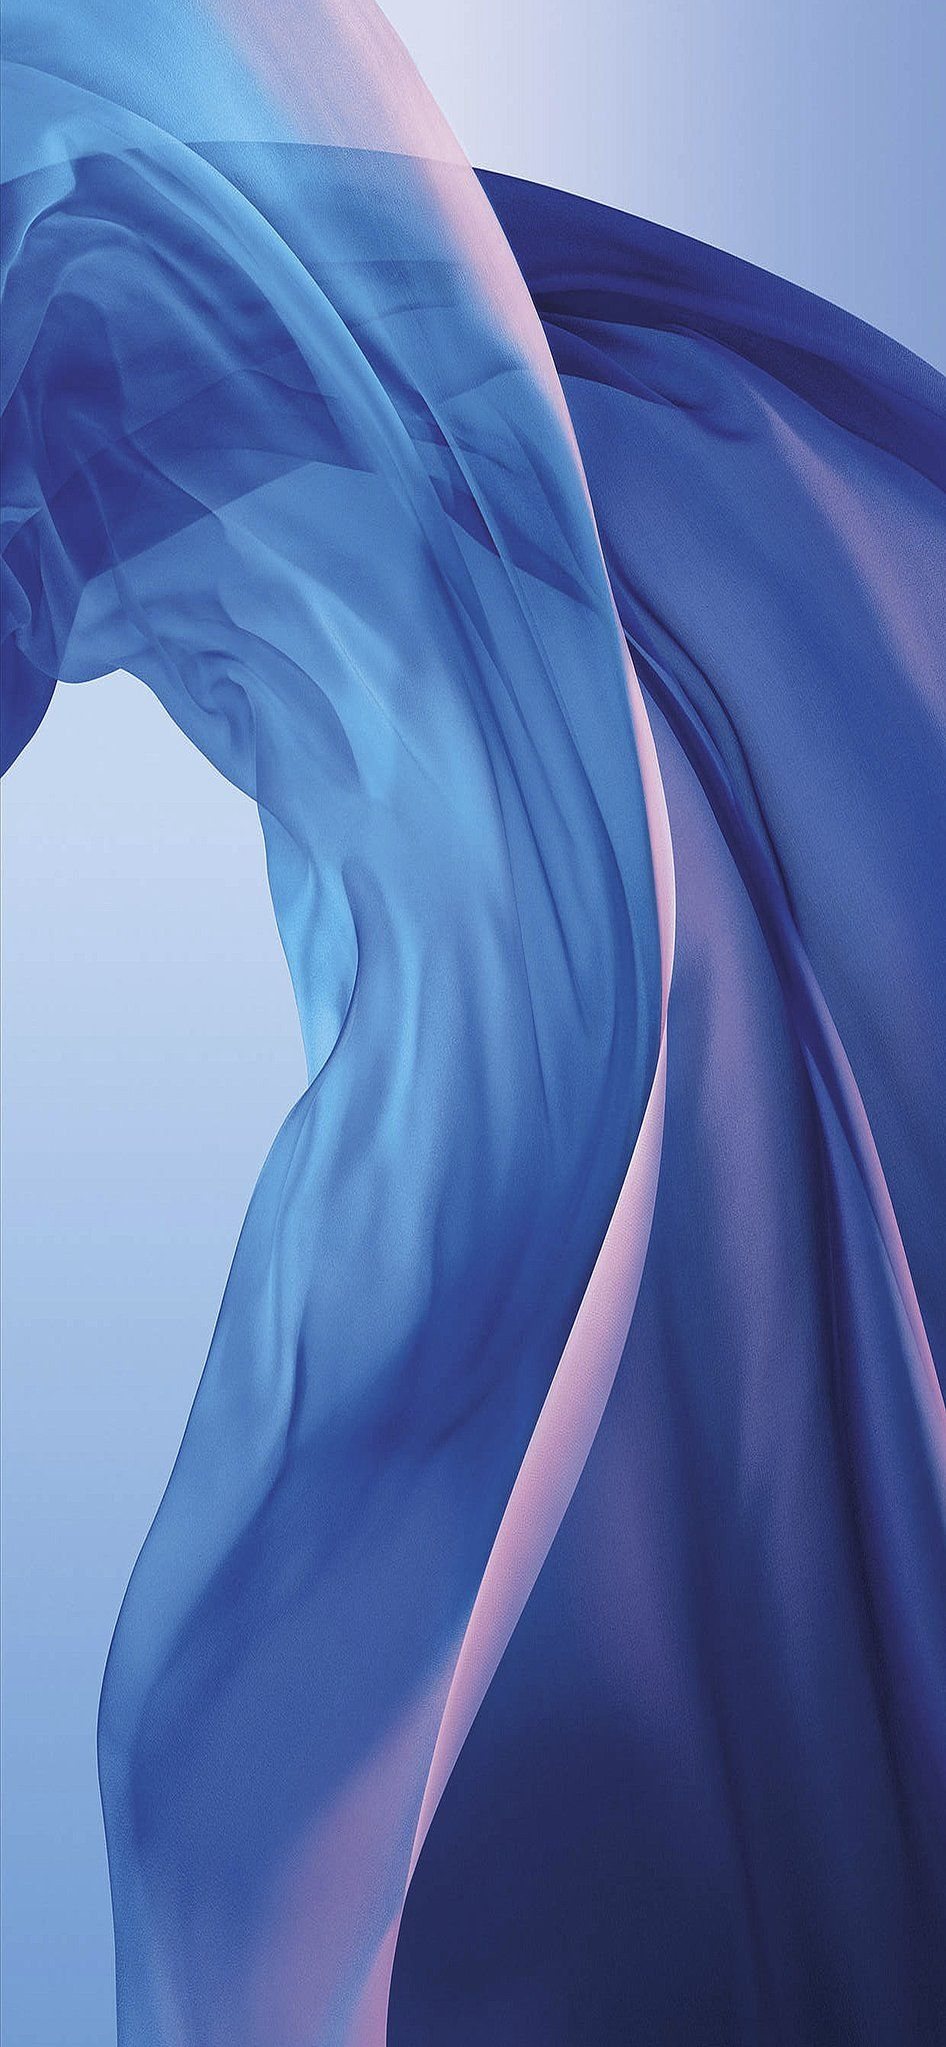 Iphone X Silk Blue Macbook Air Wallpaper Macbook Wallpaper Apple Wallpaper